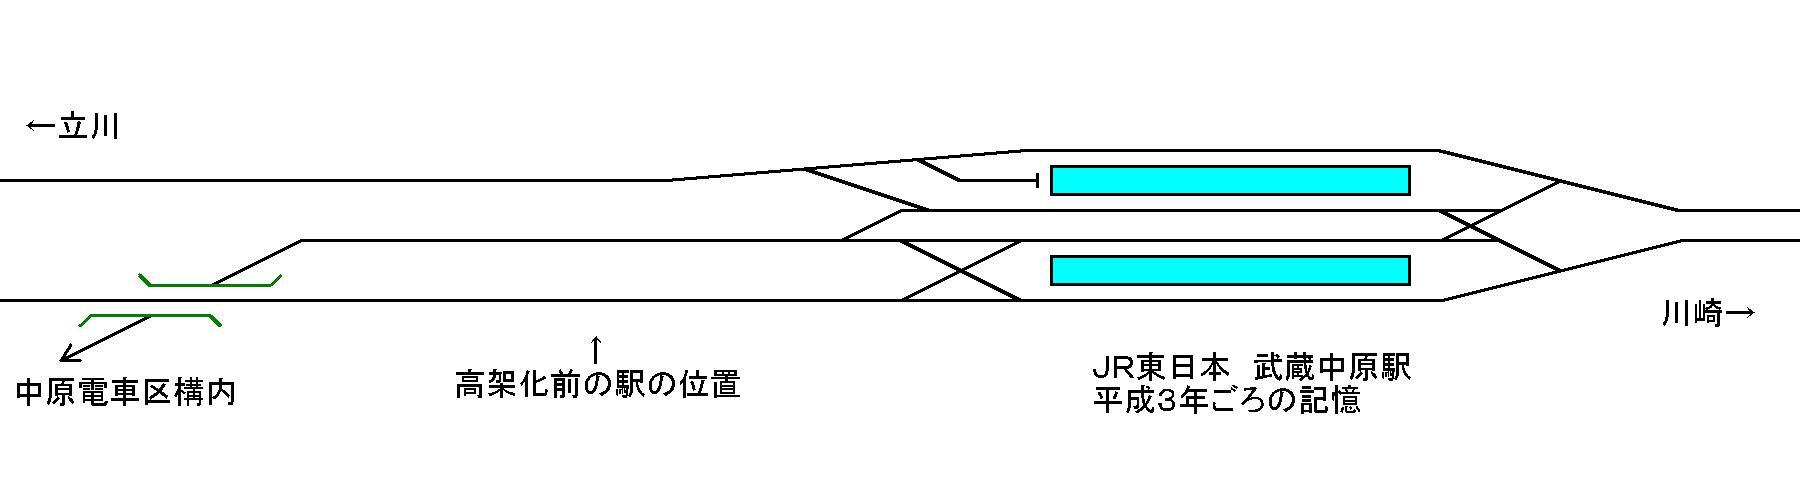 http://blog-imgs-27.fc2.com/s/e/n/senrohaichi/20080127192643.jpg